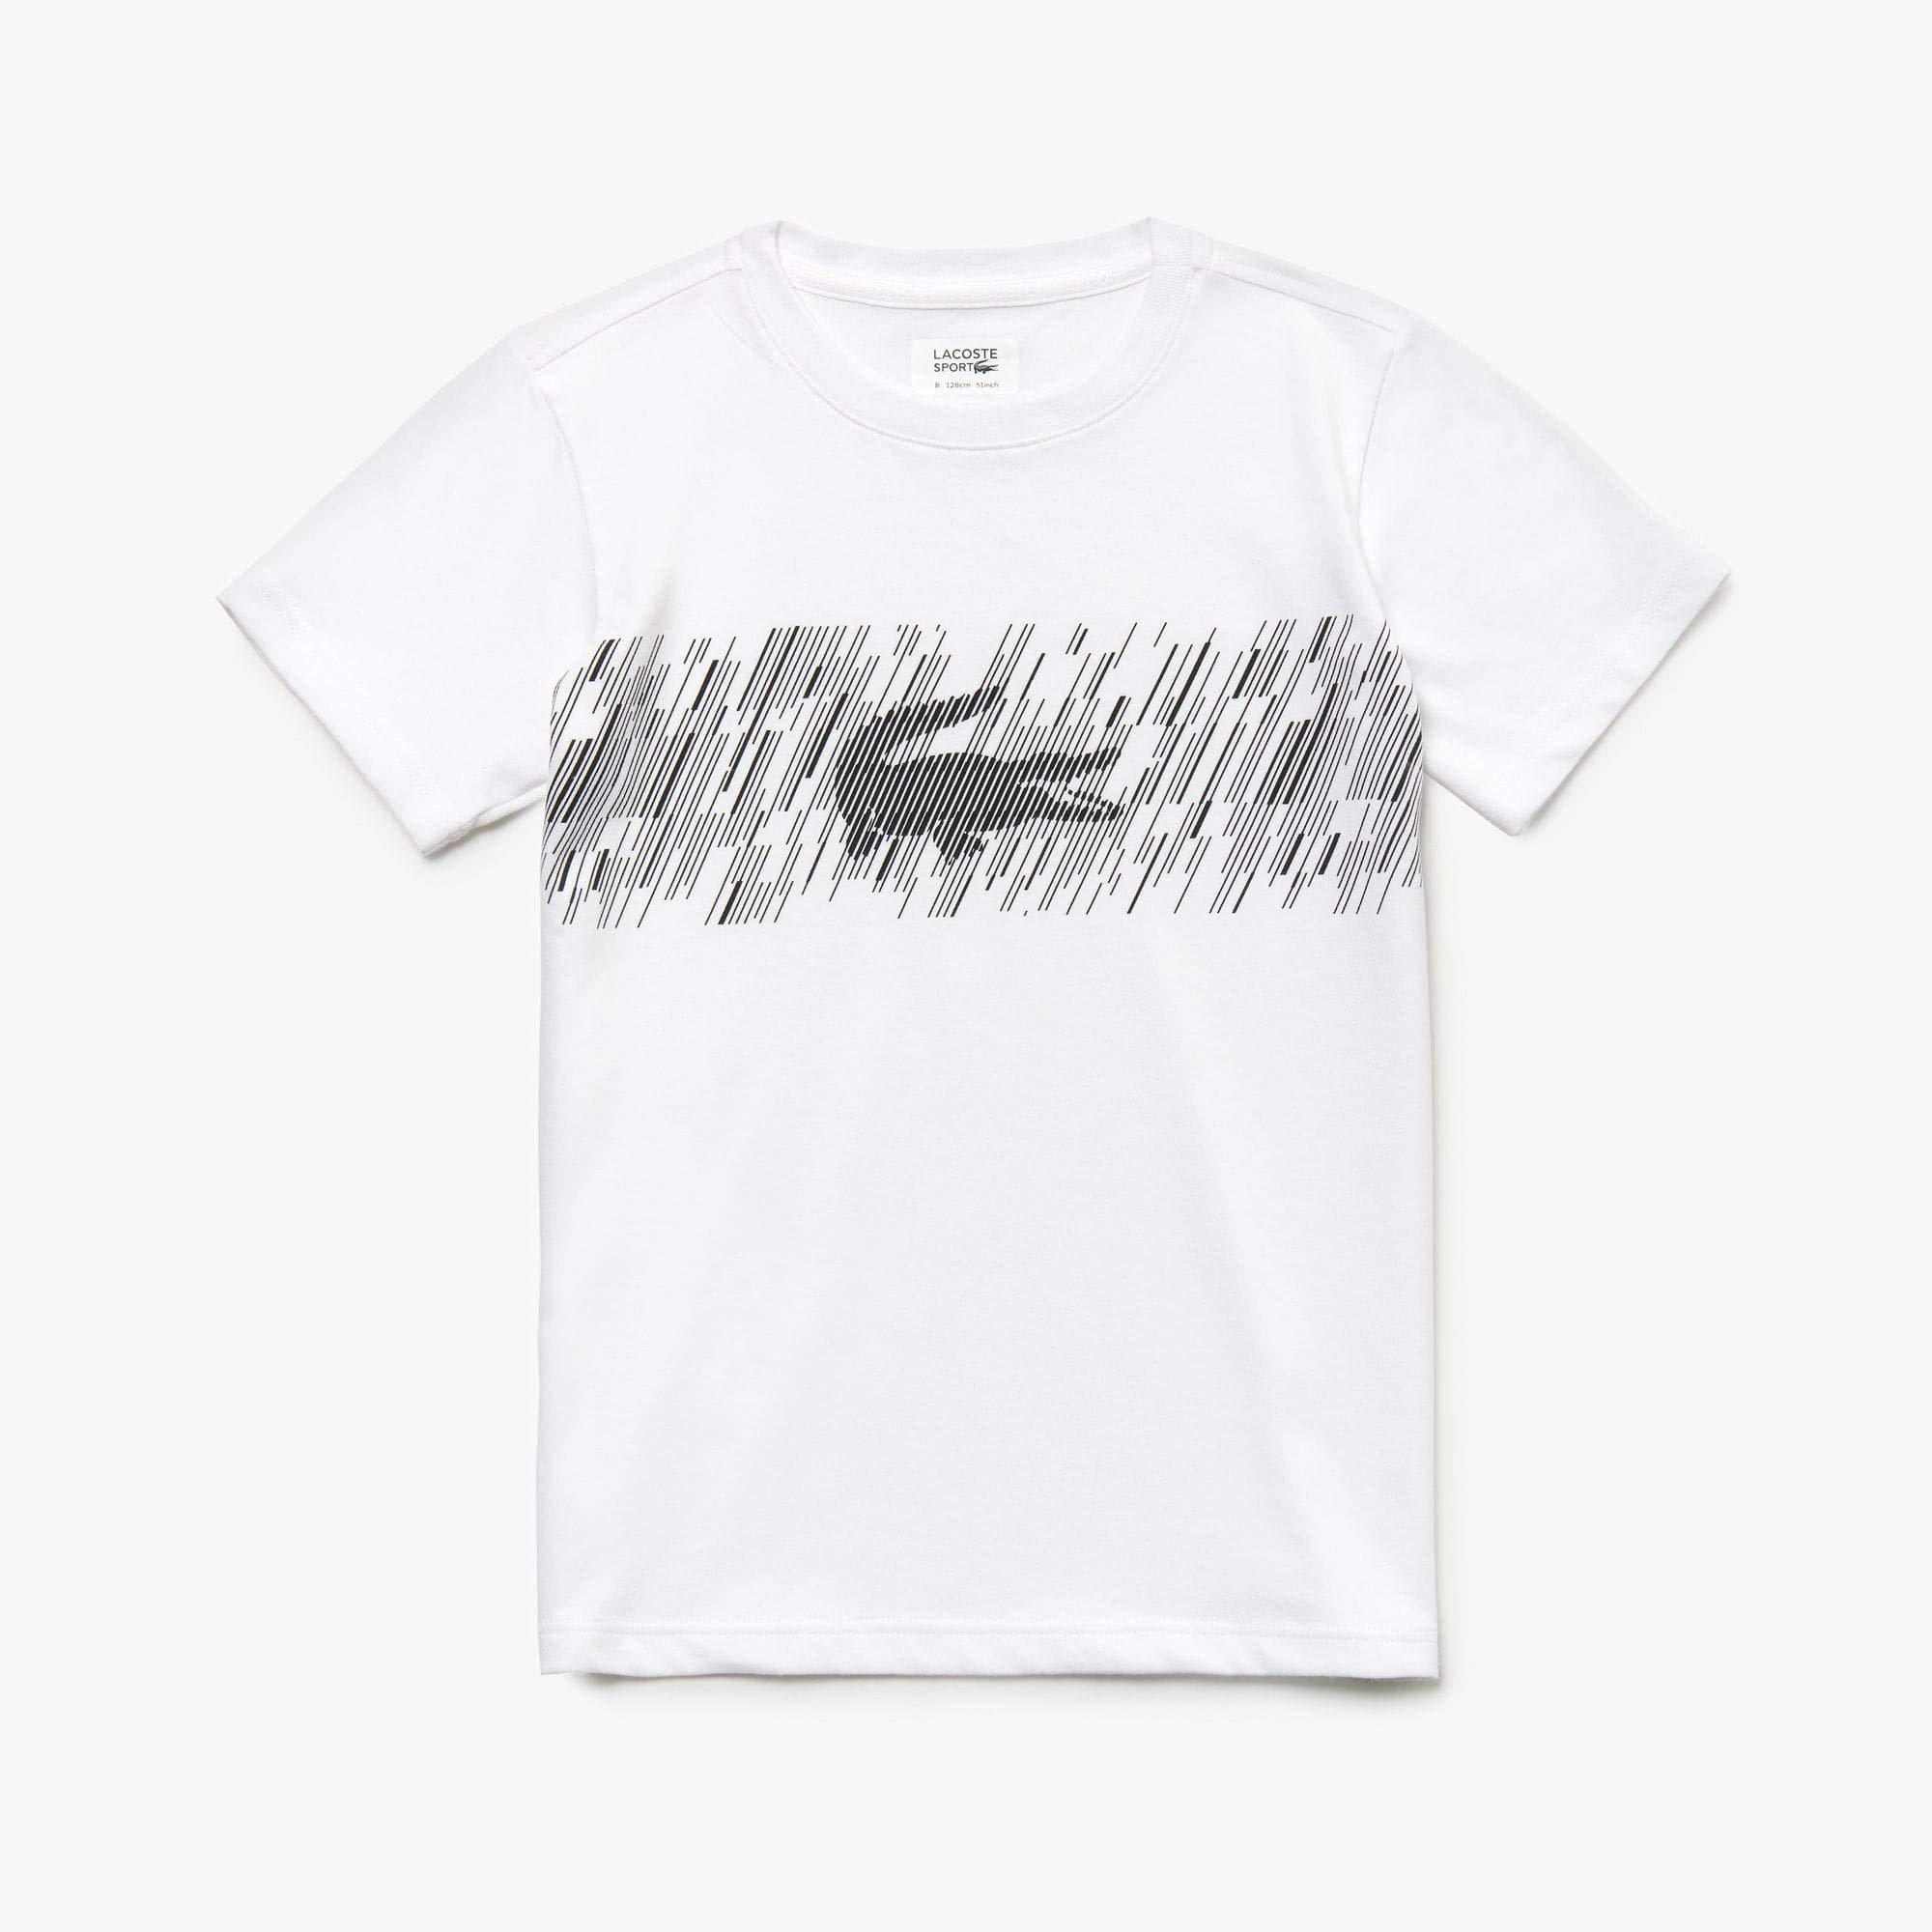 Lacoste Big BOY Graphic Crocodile T-Shirt, White/Black, 12YR